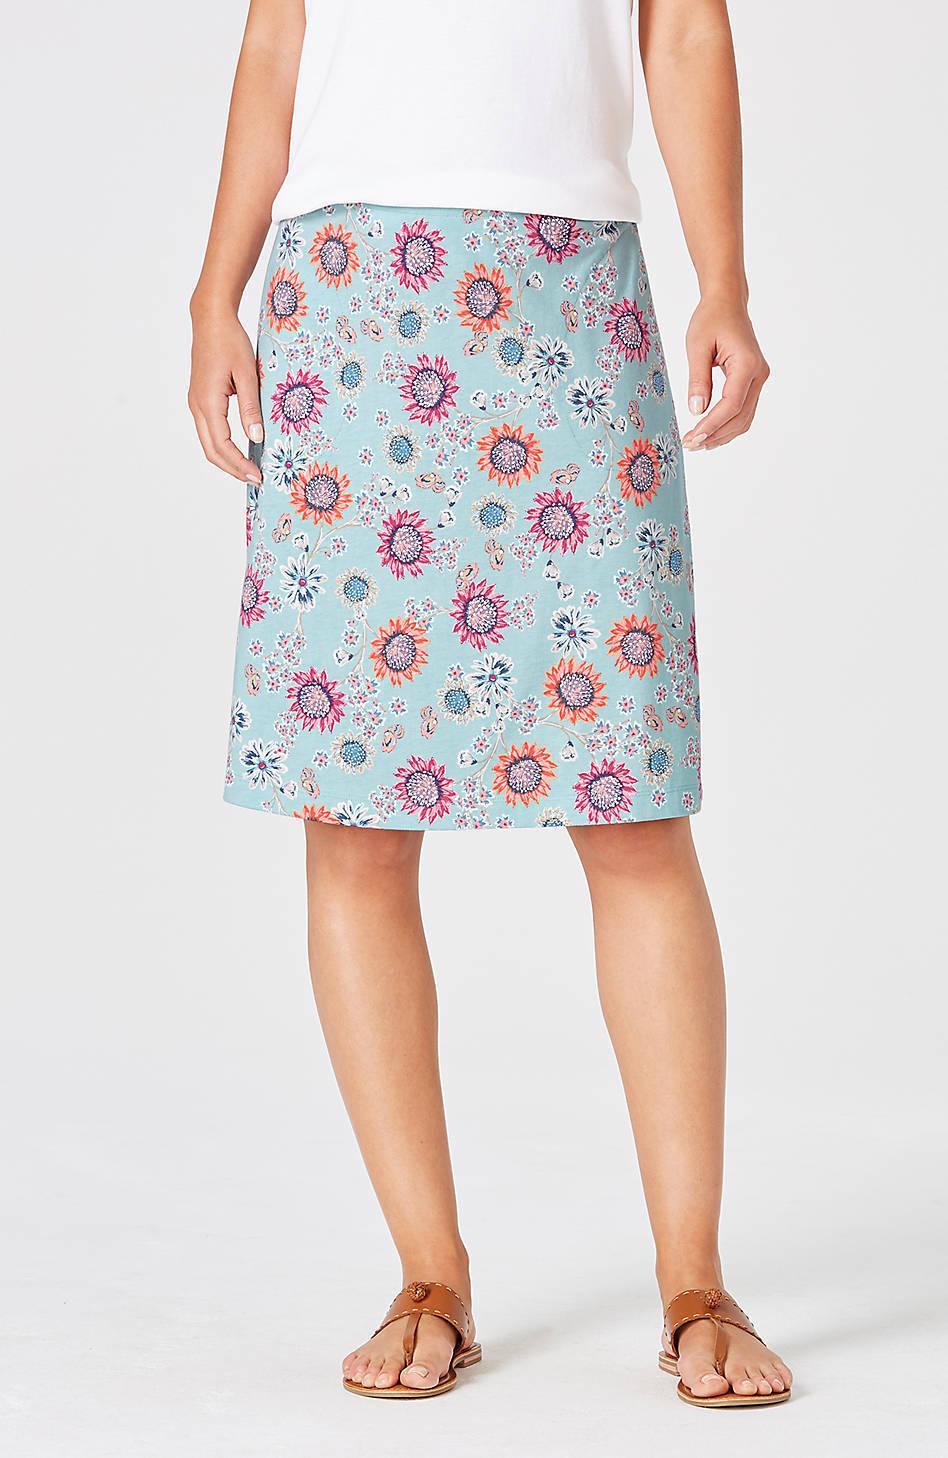 J. Jill - 1X(Plus) - Very Pretty bluee Tint Floating Sunflowers Skirt - NWT